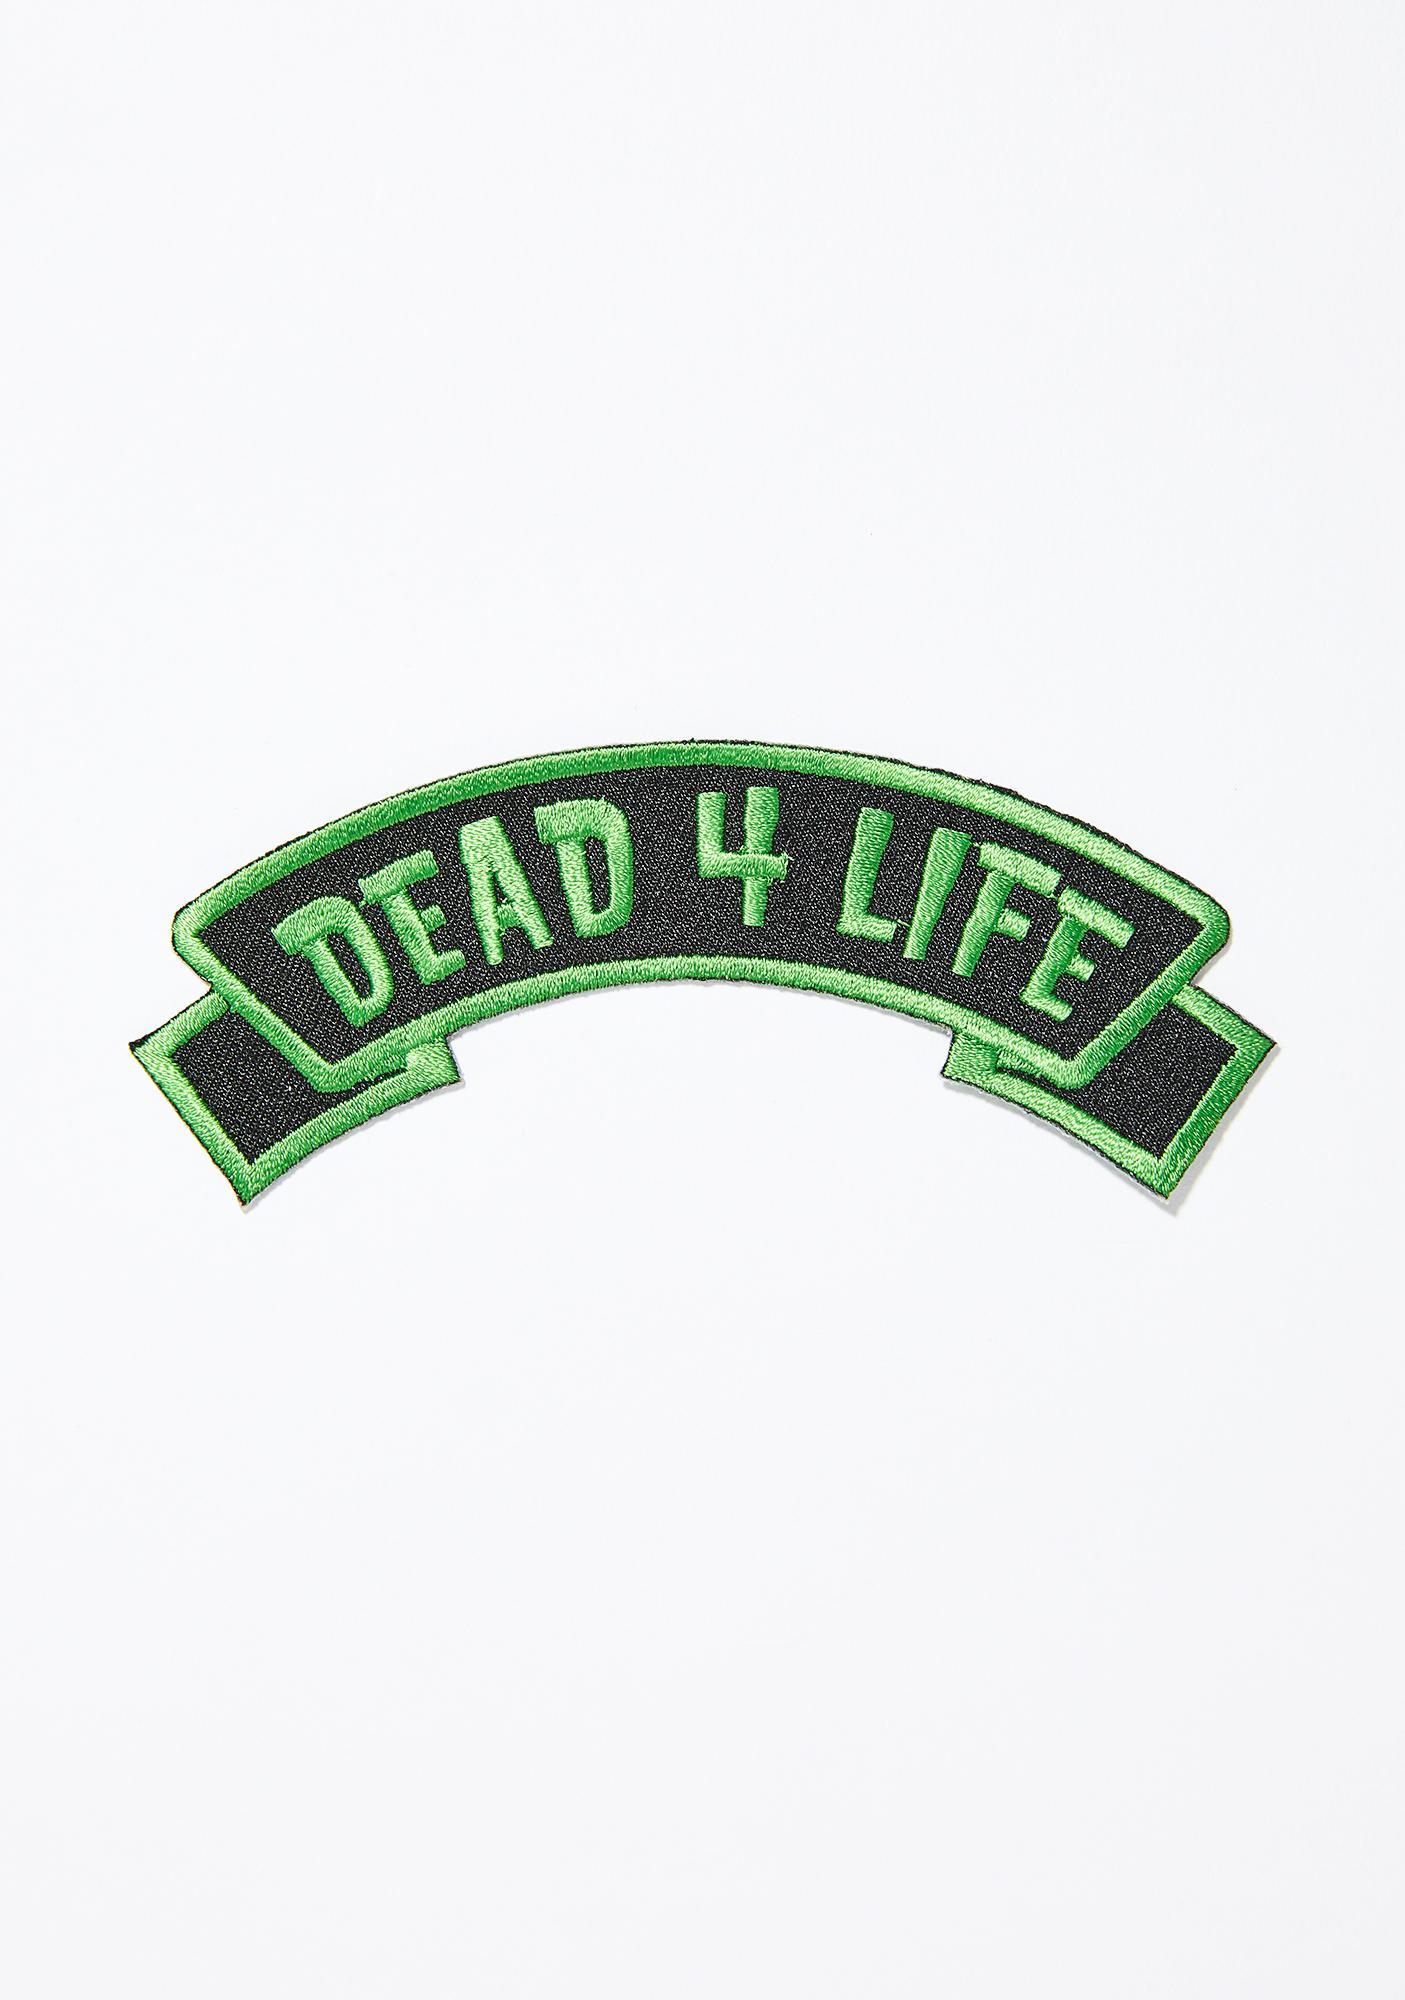 Kreepsville 666 Dead 4 Life Patch